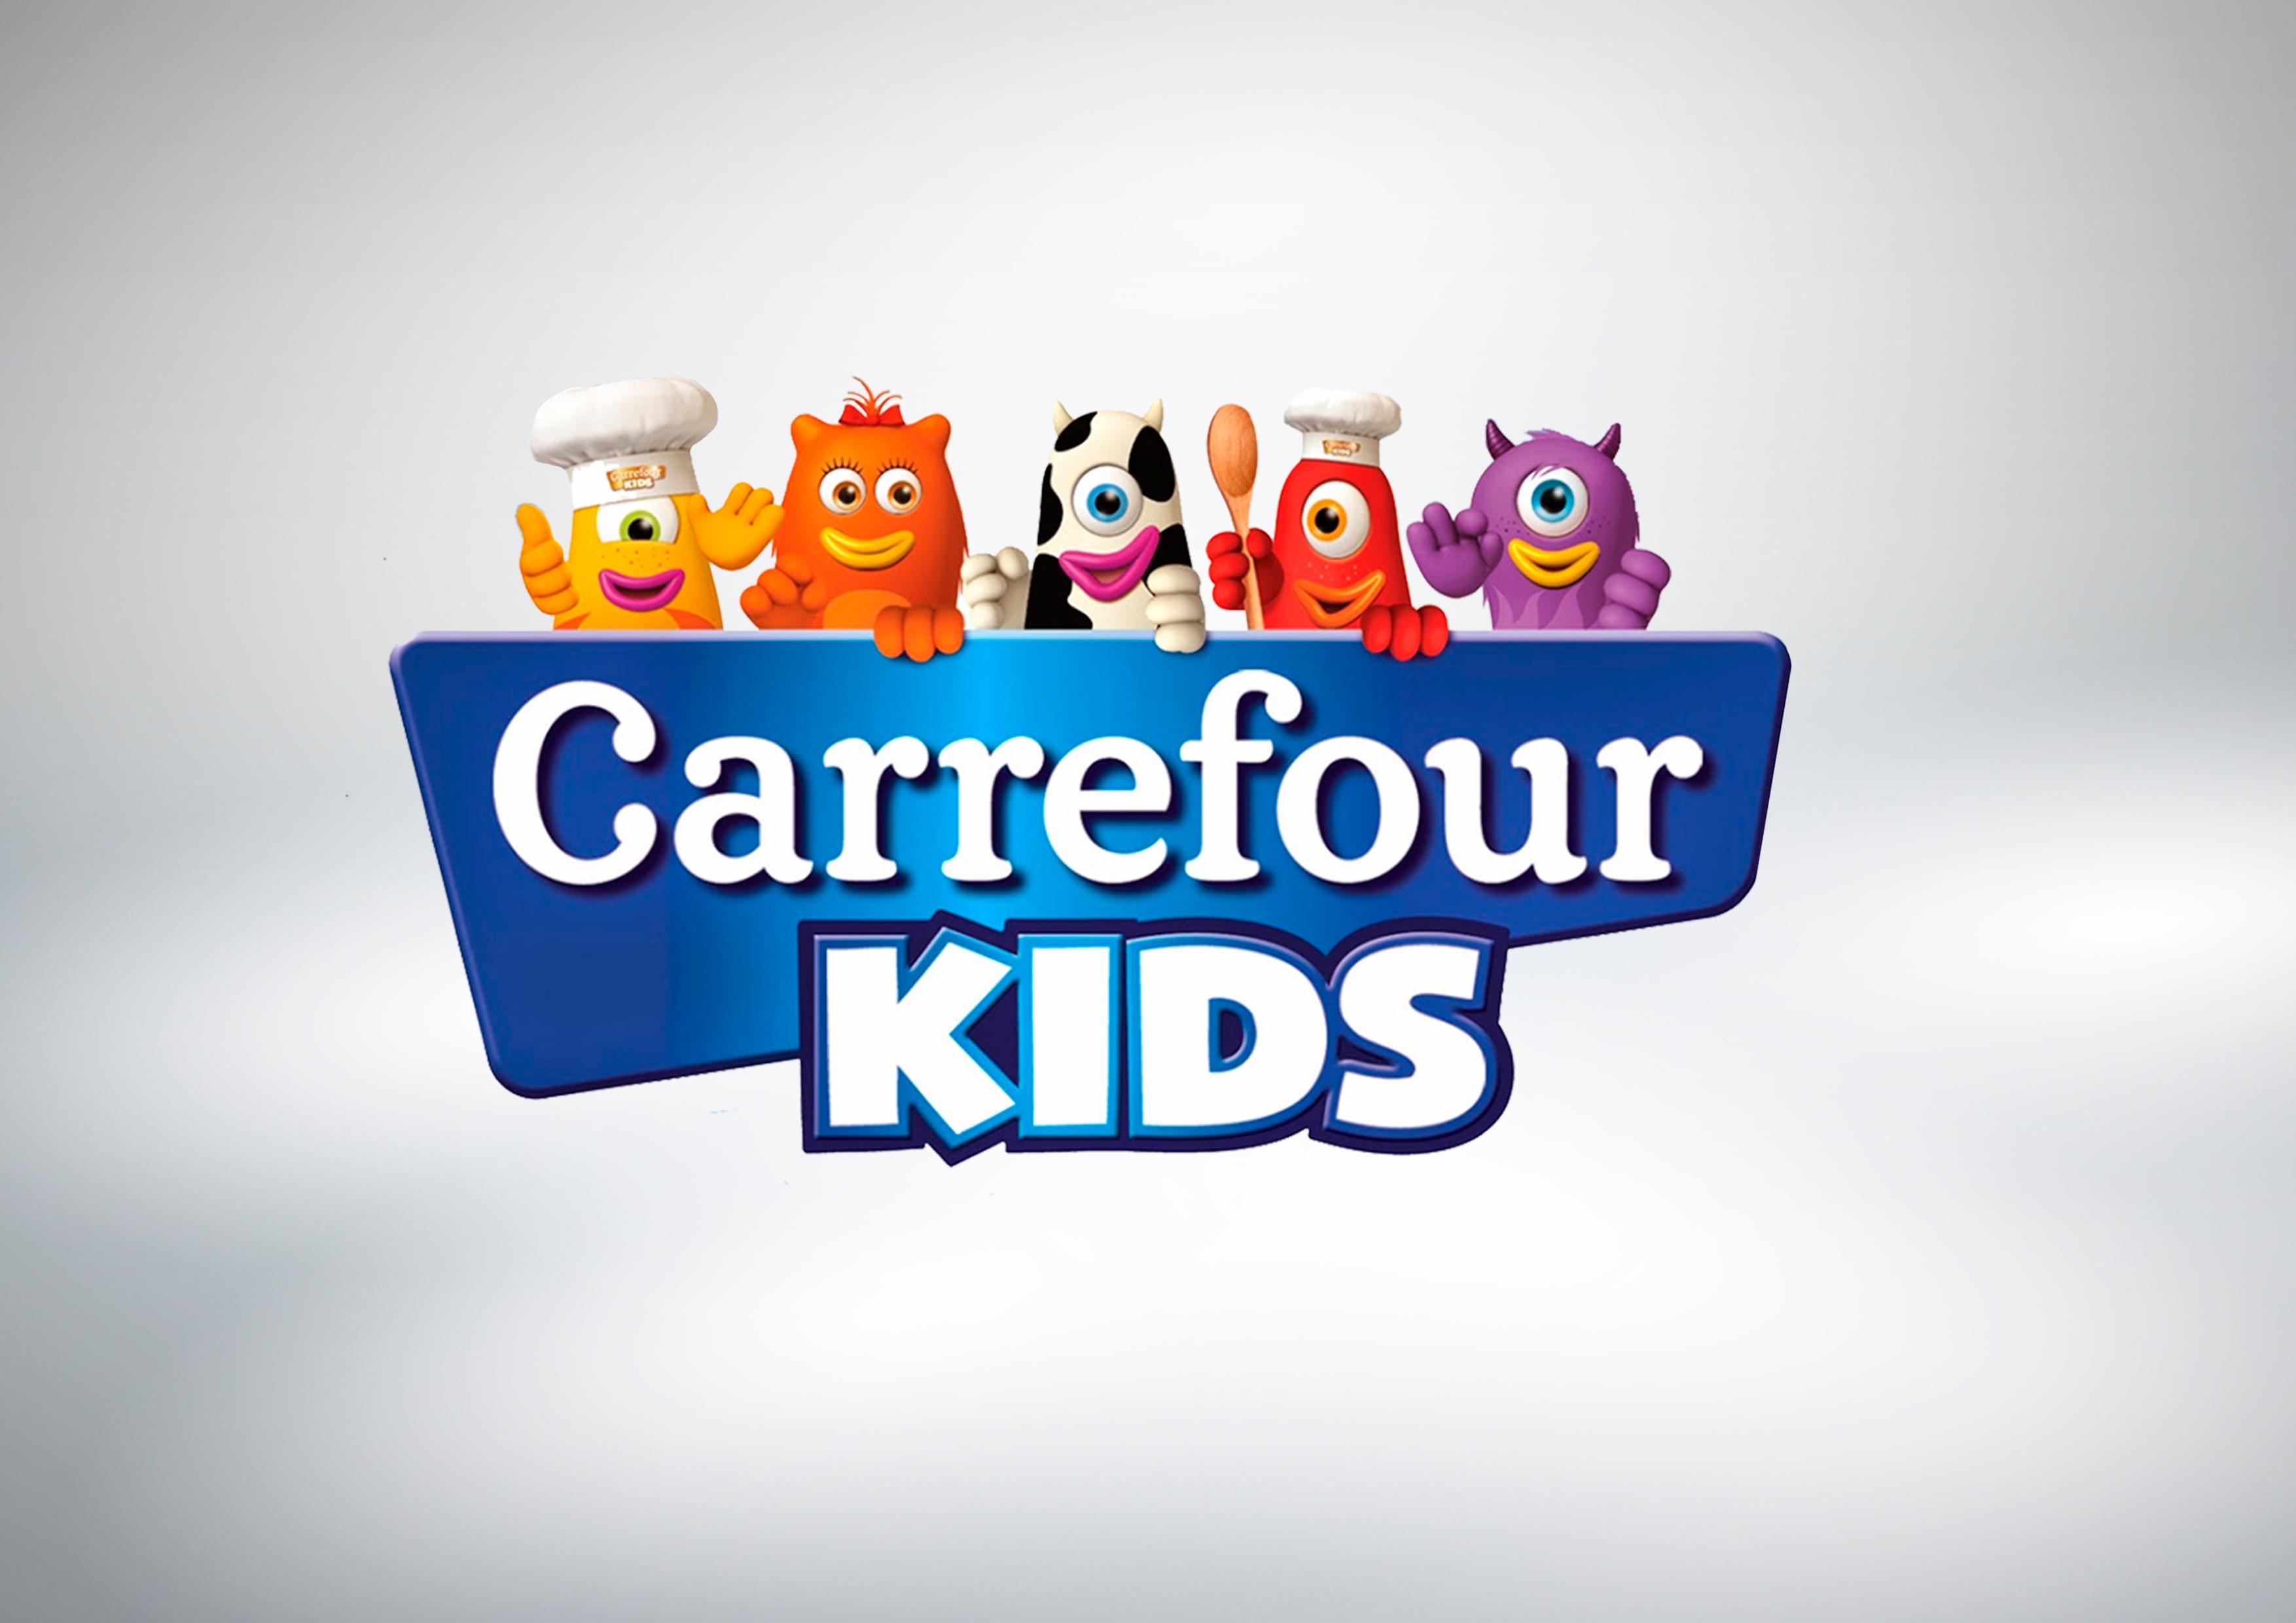 1ad03d4d5aa5 Carrefour KIDS - Nuestras Marcas - Carrefour España